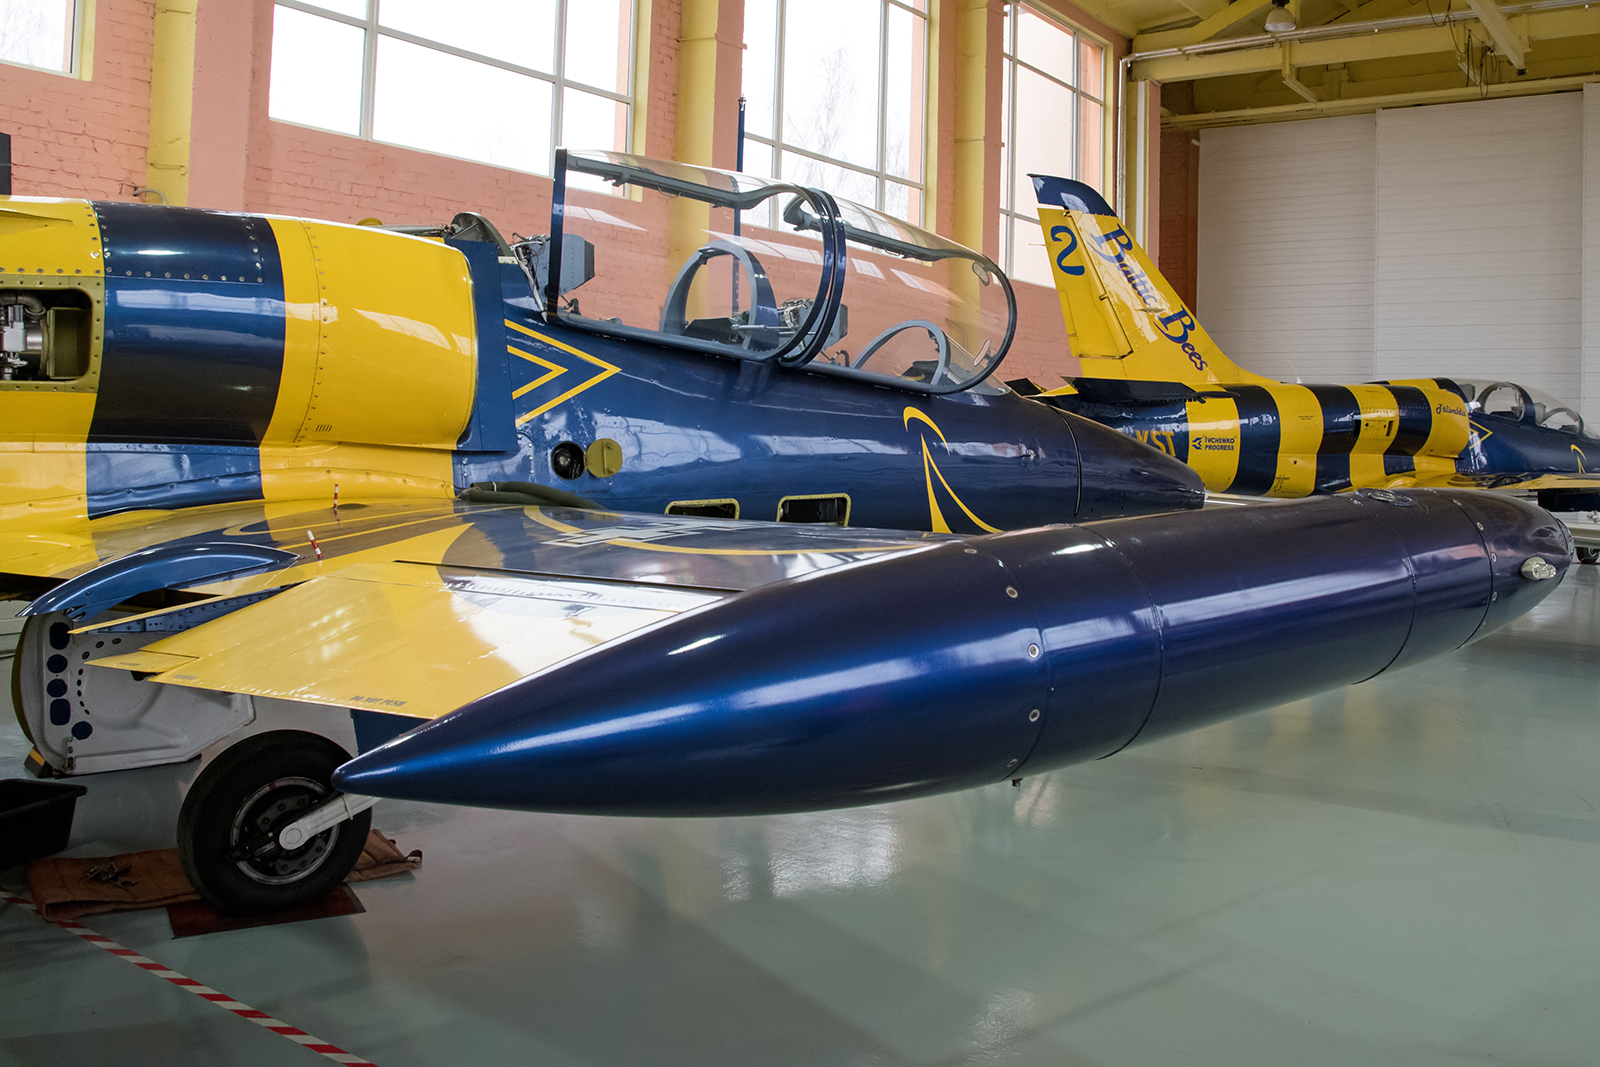 © Duncan Monk - Baltic Bees L-39C Albatross - Baltic Bees Jet Team